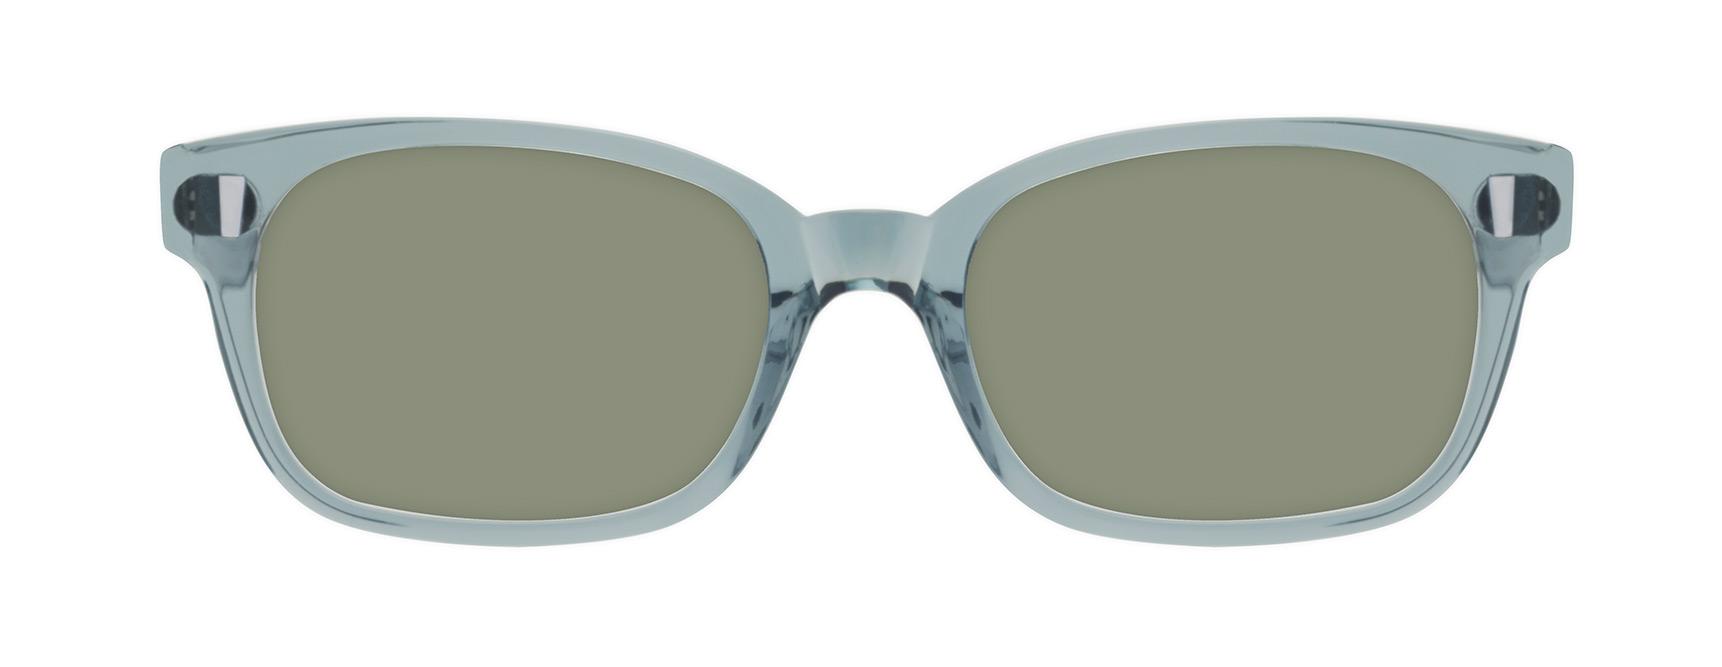 moscot-eyewear-ss2013-12